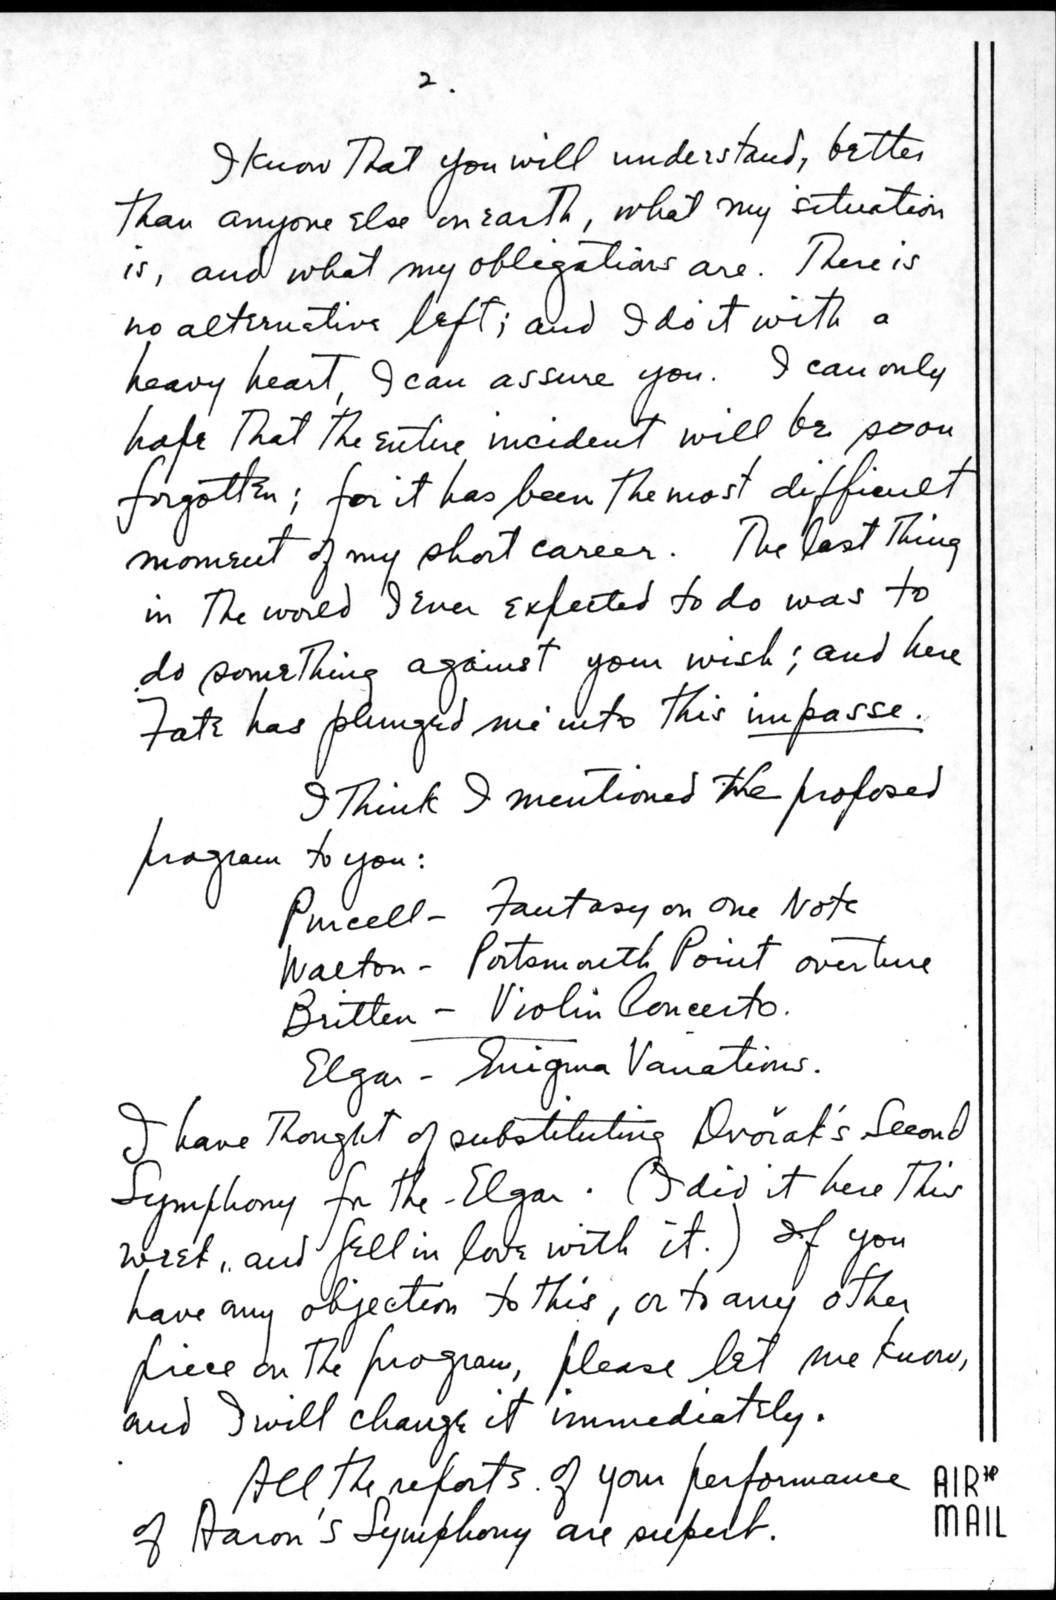 Letter from Leonard Bernstein to Serge Koussevitzky, n.d.